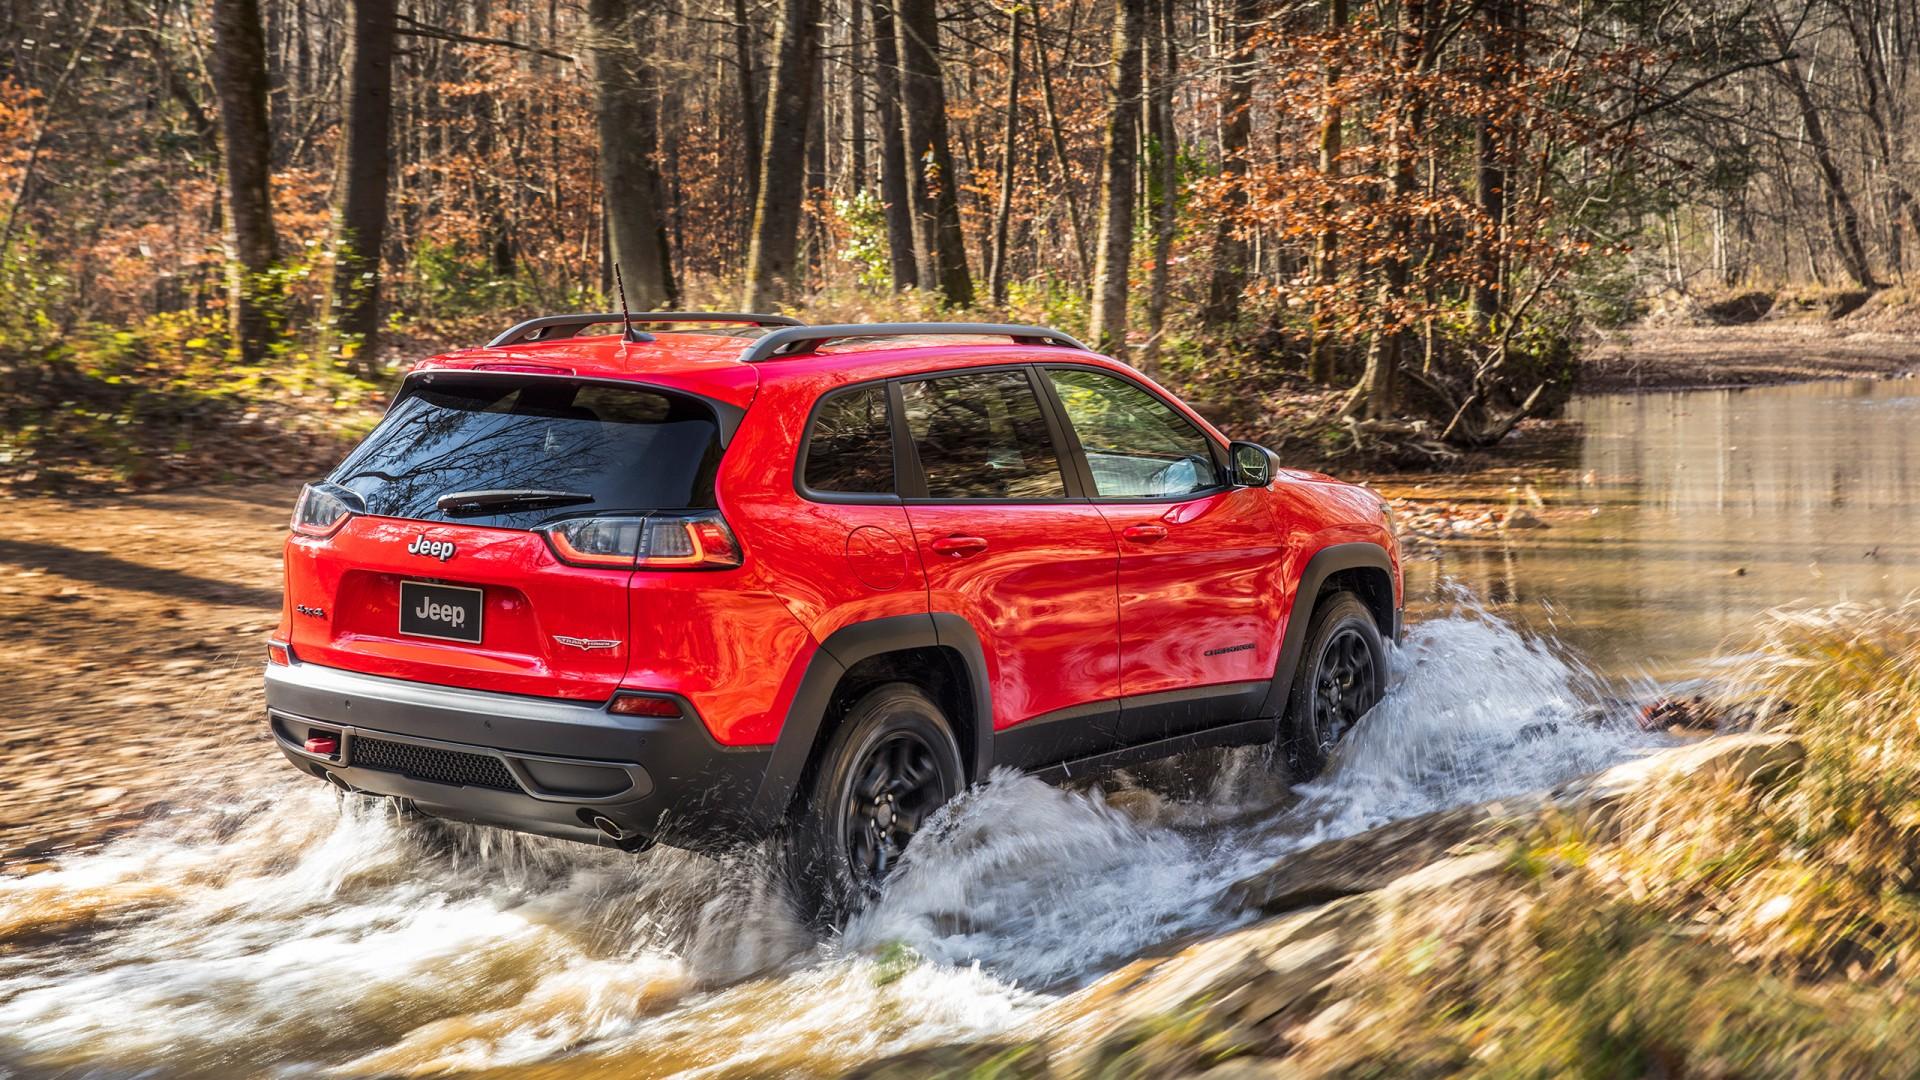 2019 Jeep Cherokee Trailhawk 4 Wallpaper | HD Car ...